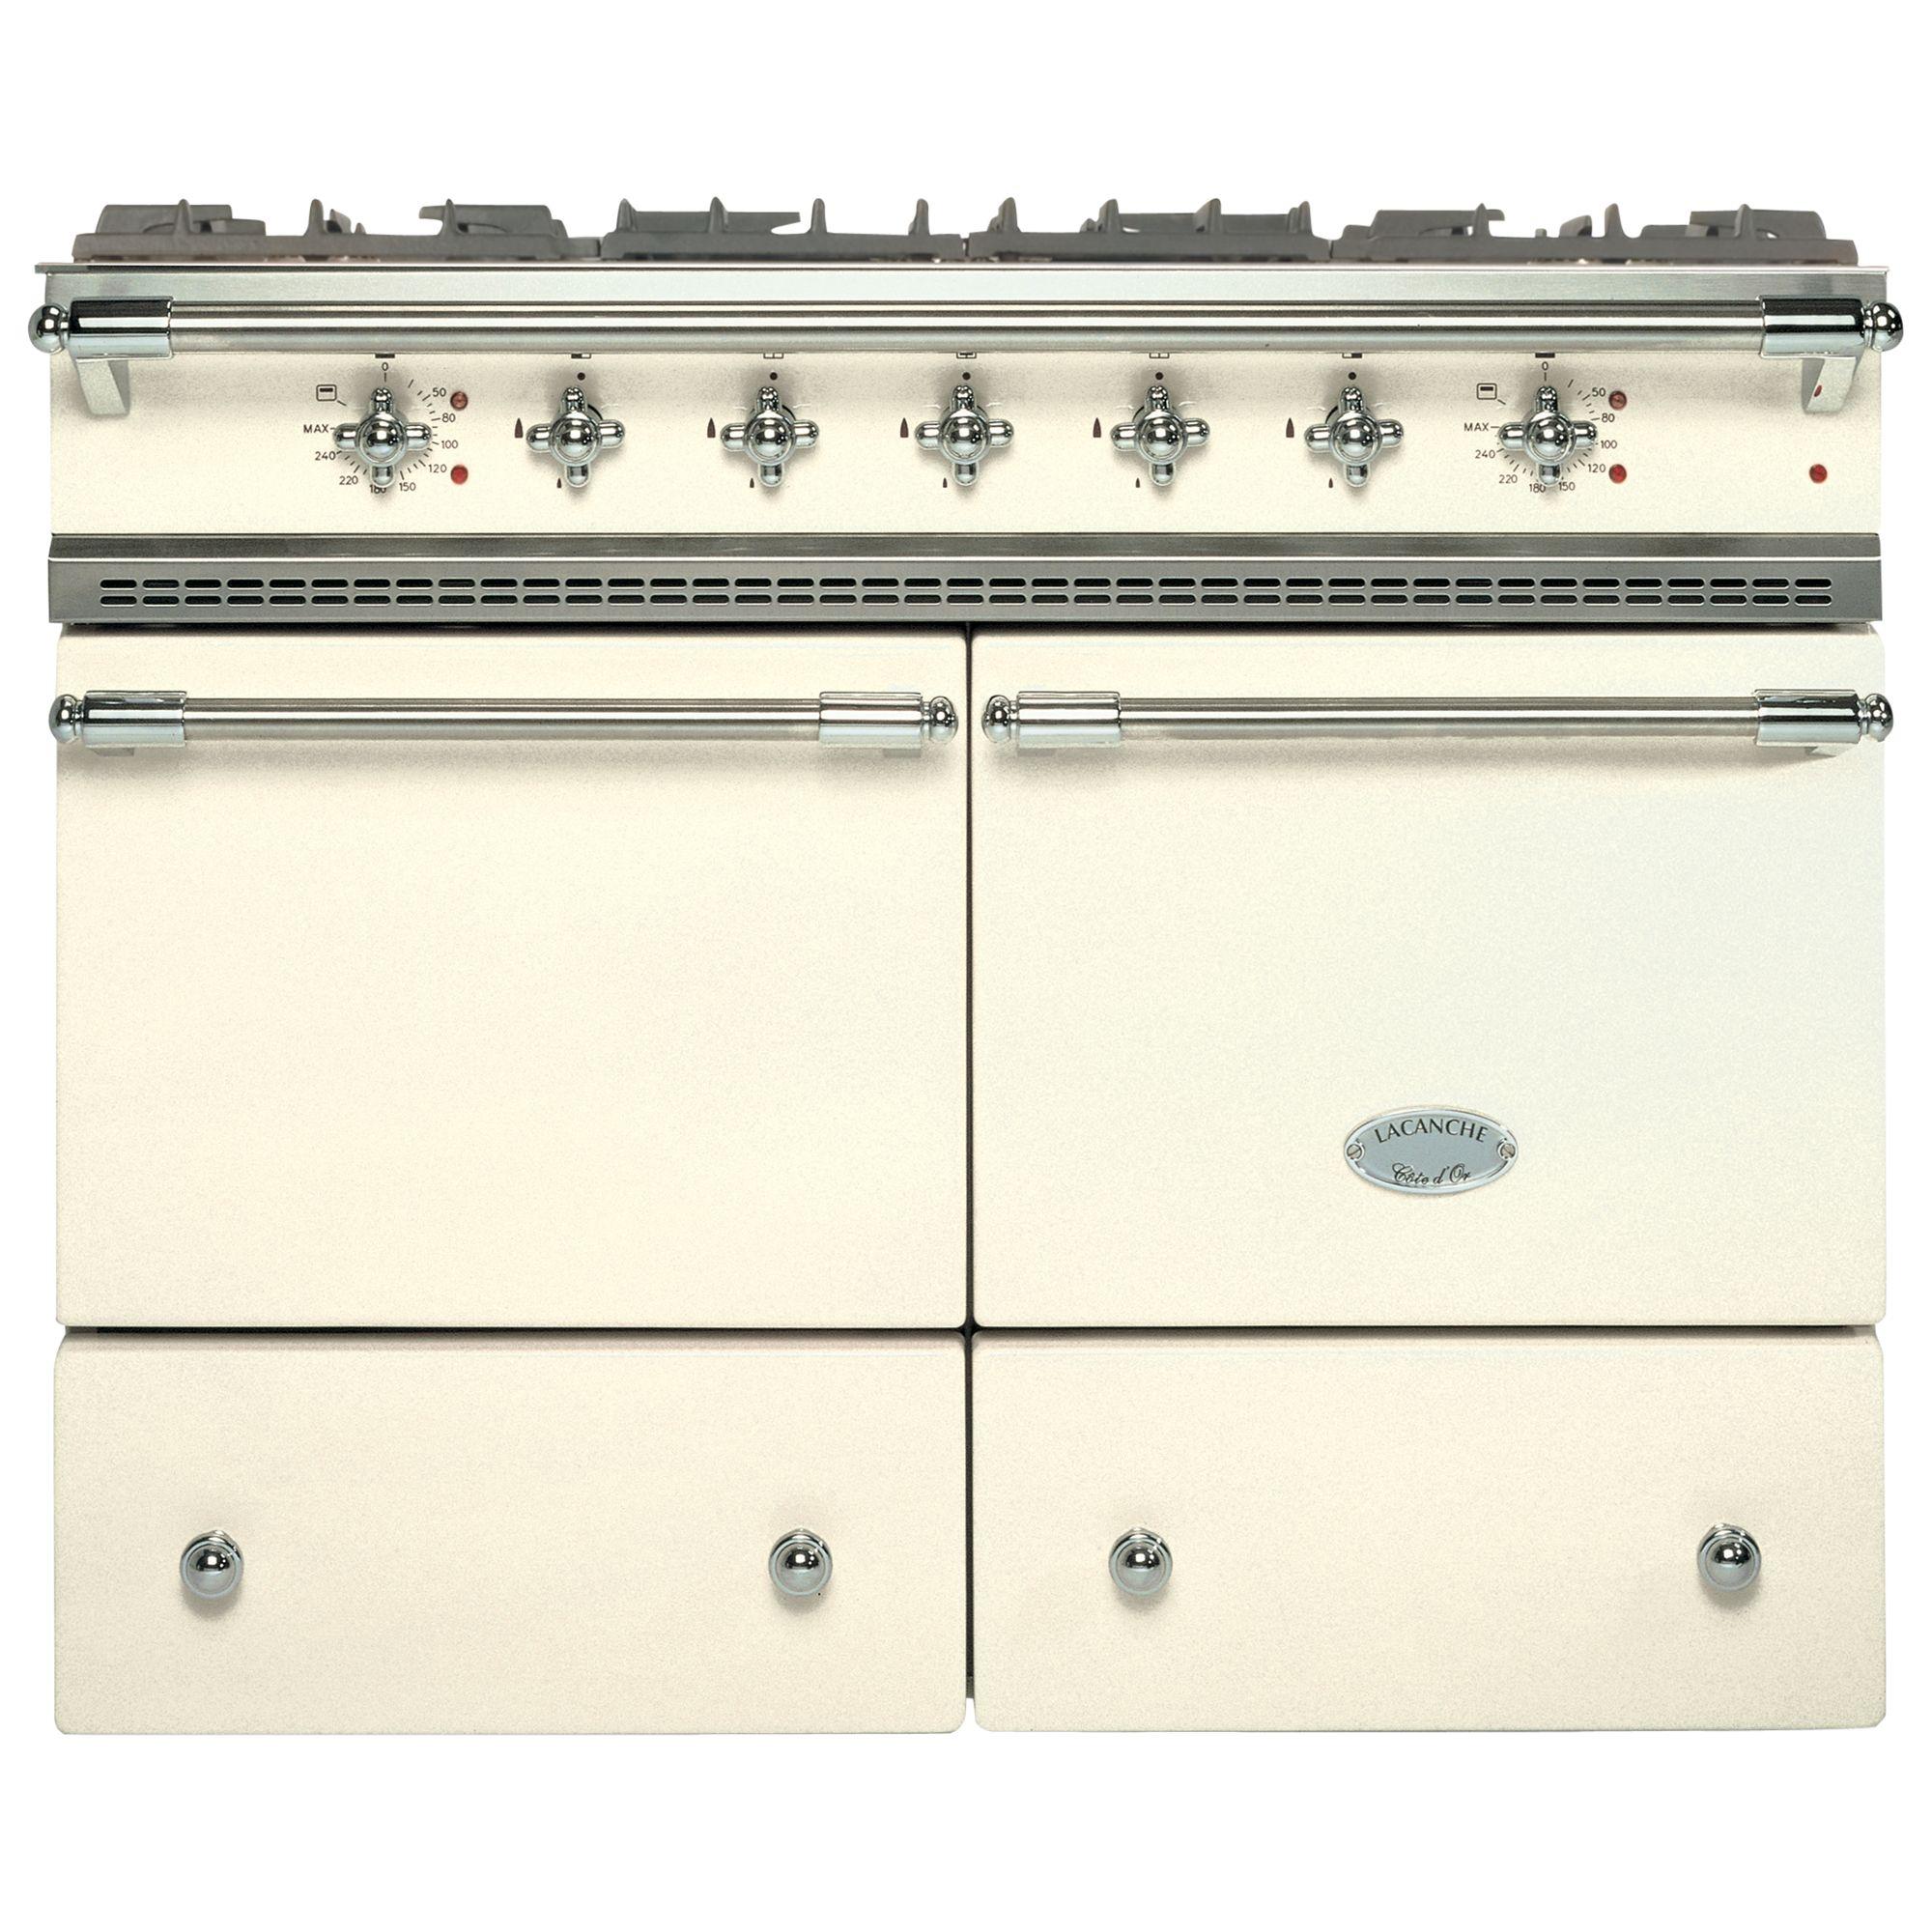 Lacanche Lacanche Cluny LG1052GCT Dual Fuel Range Cooker, Ivory / Chrome Trim